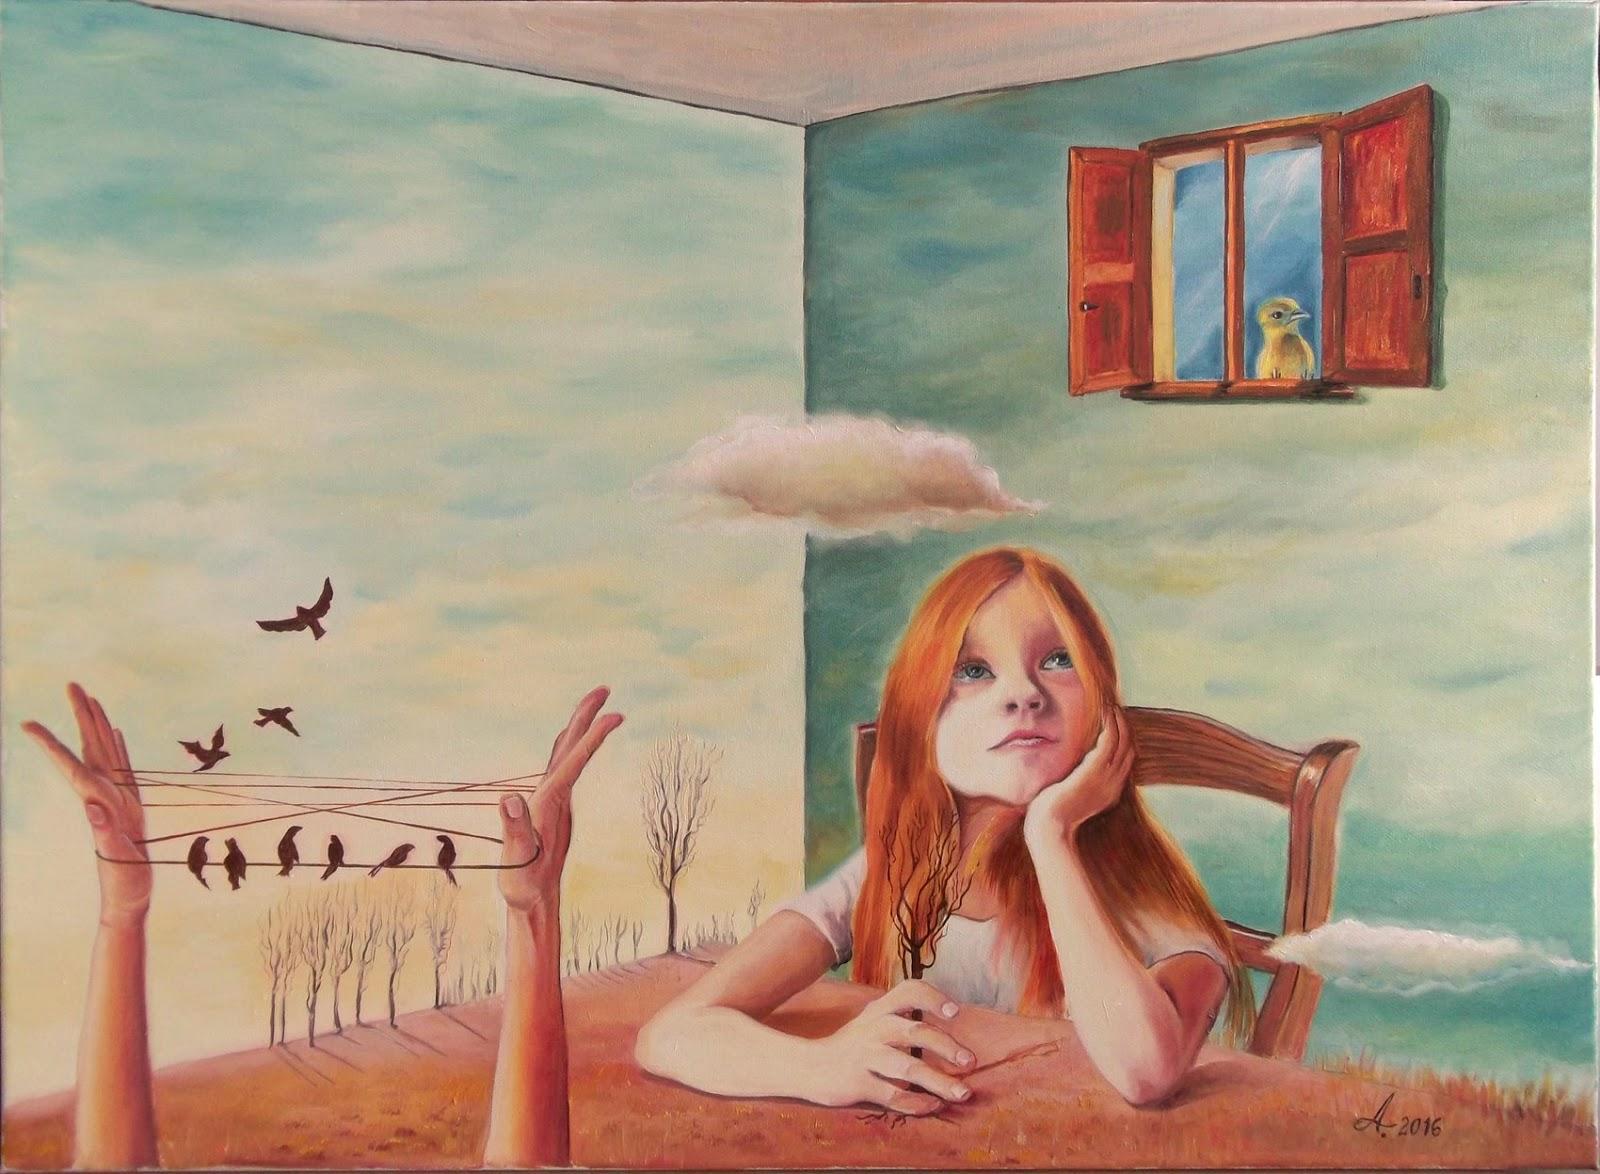 Paintings by Romanian Artist - Adina Lupan  (Adina Lohmuller)